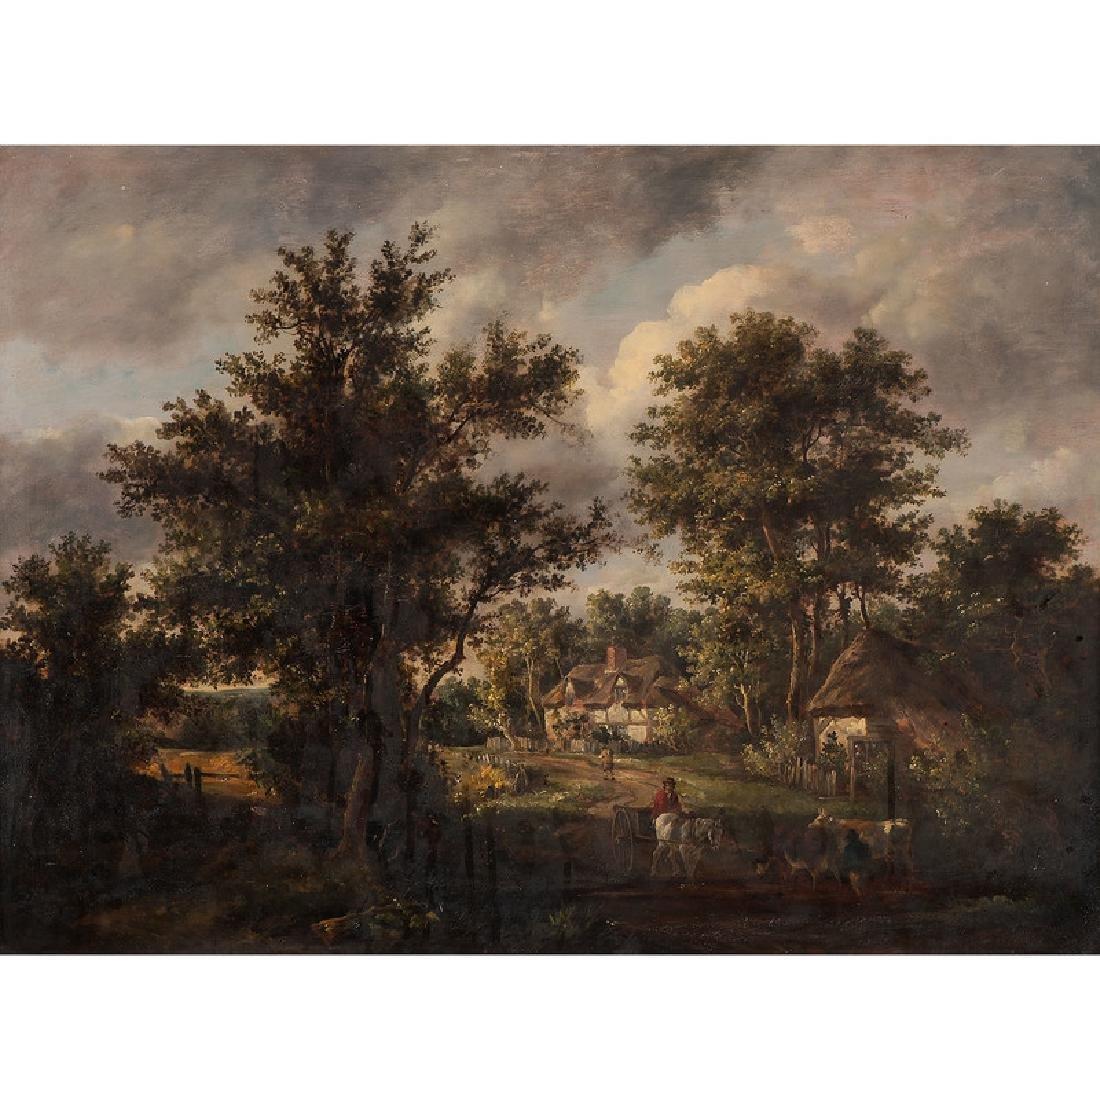 Charles Towne (English, 1763-1840) - 2